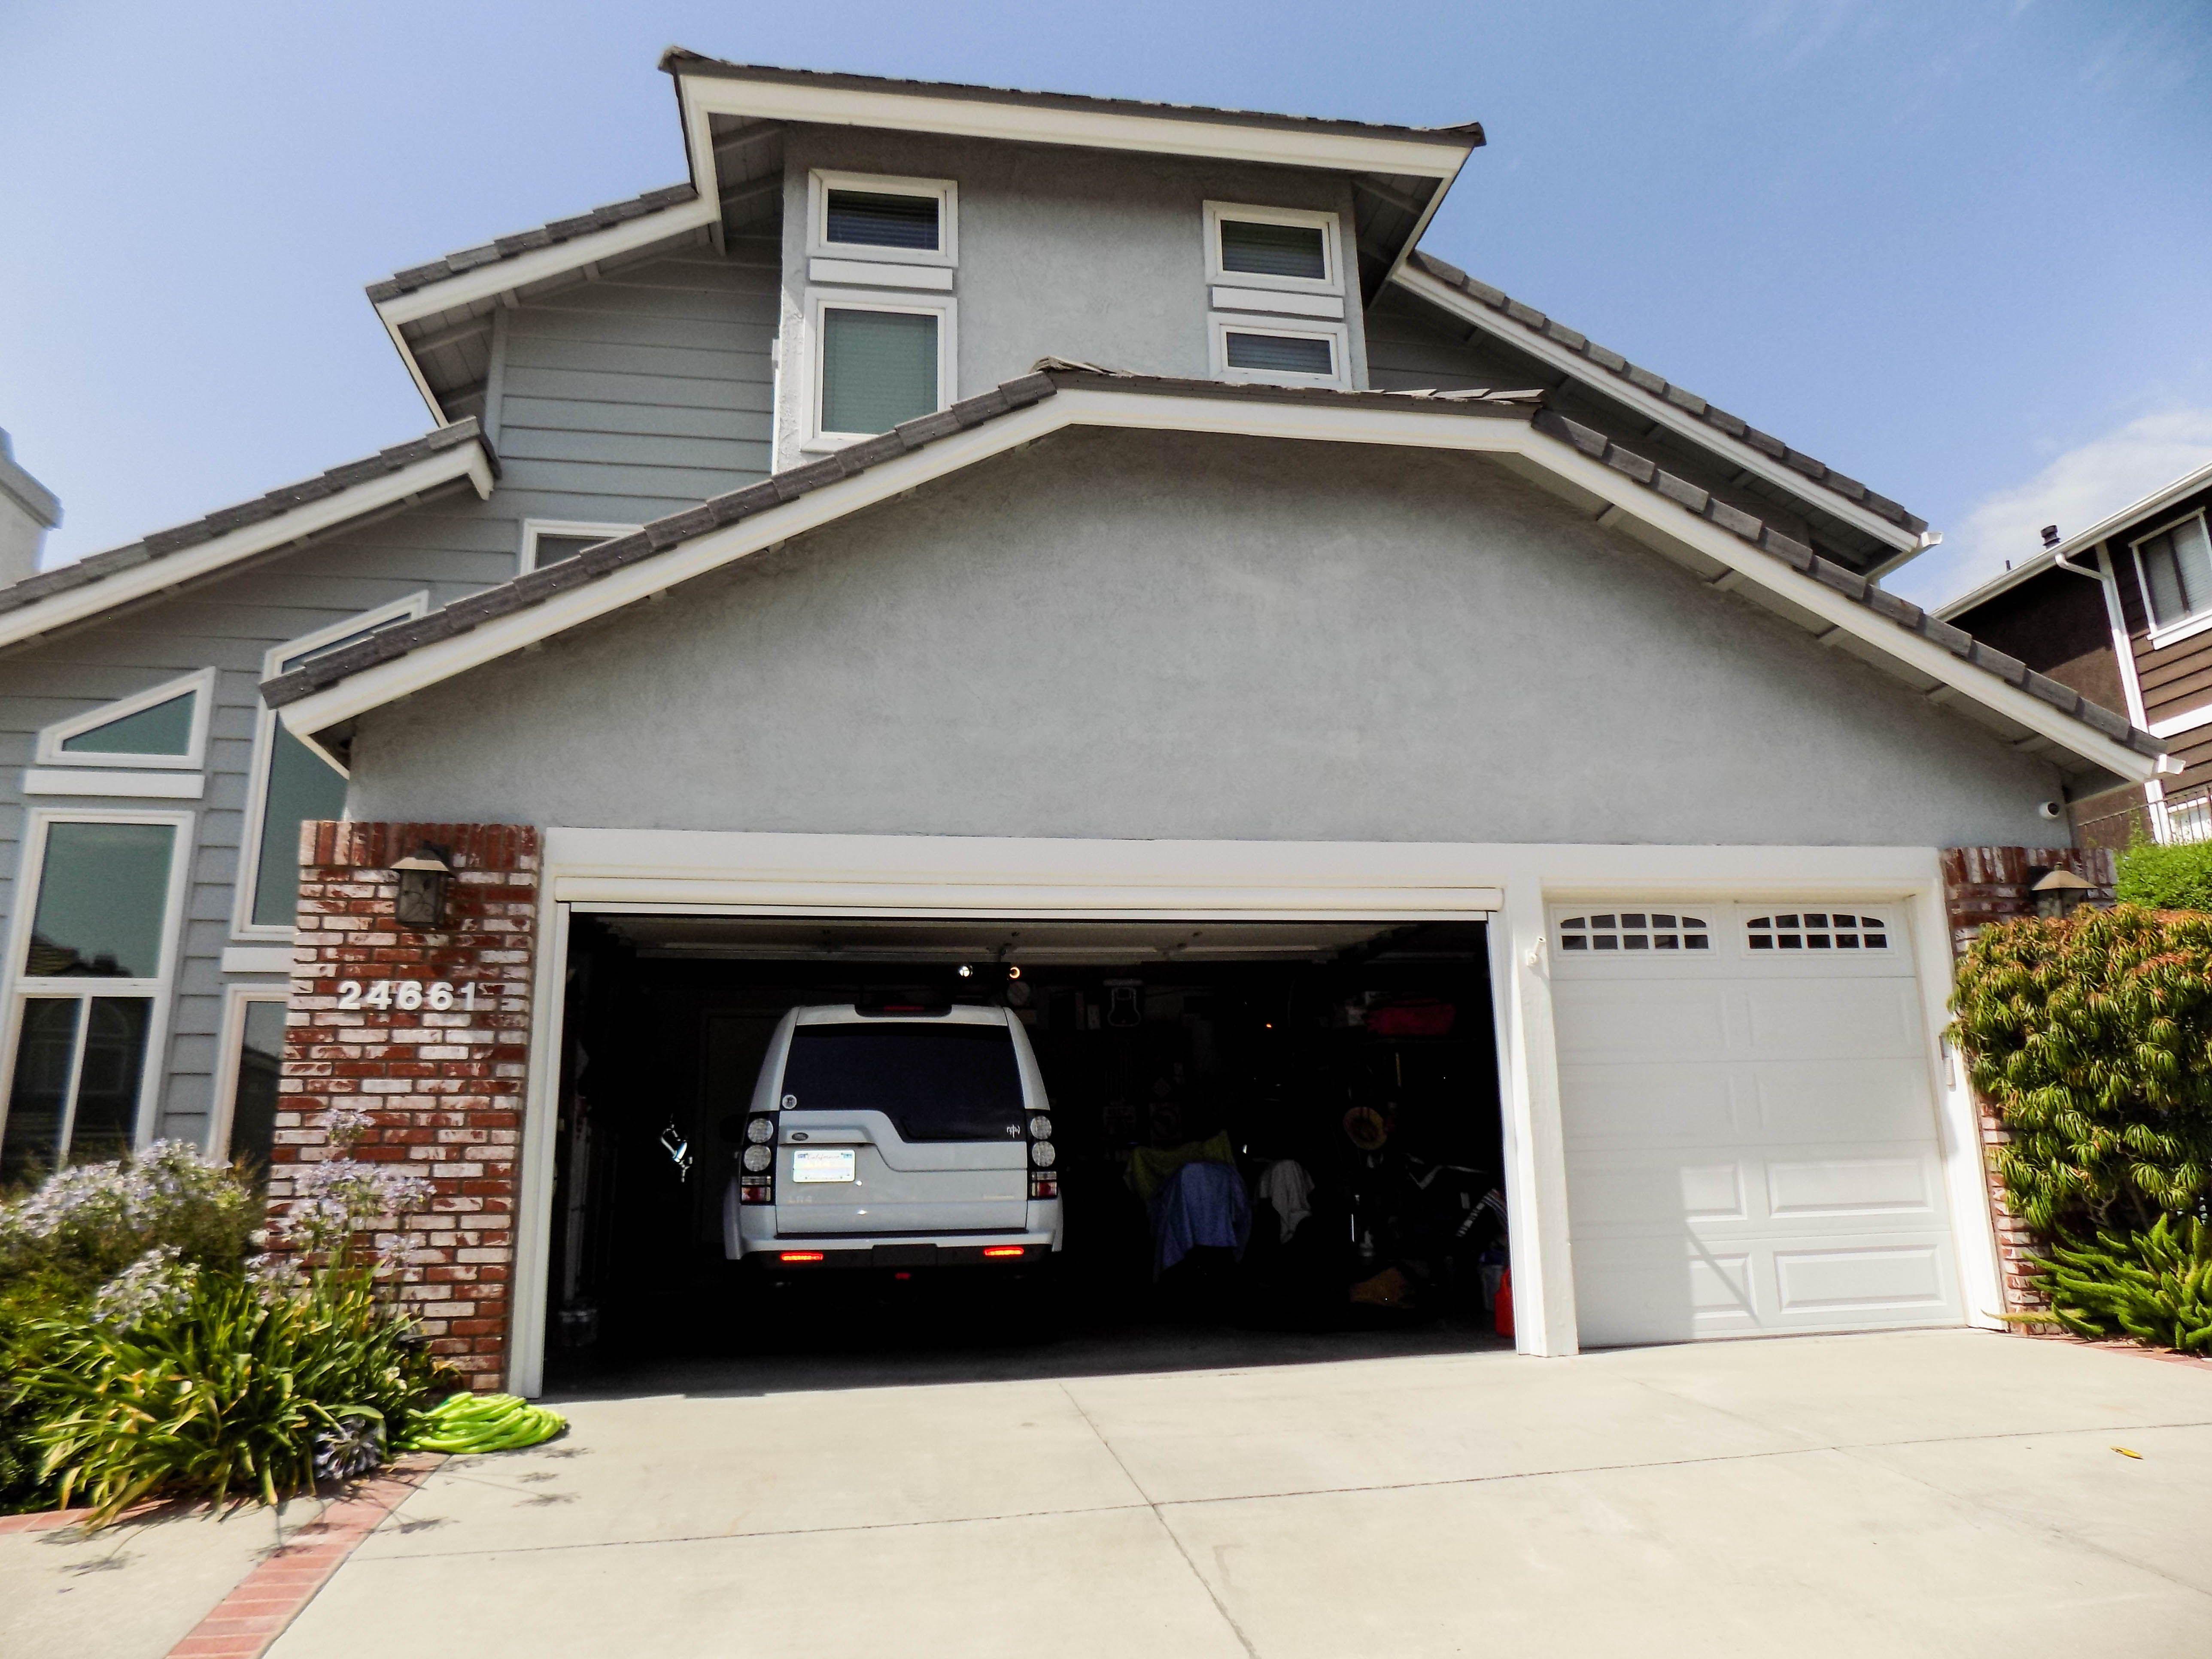 We Installed A Motorized Power Screen On A Garage Door In Laguna Hills California In Orange County Fo With Images Traditional Style Homes Garage Doors Garage Screen Door